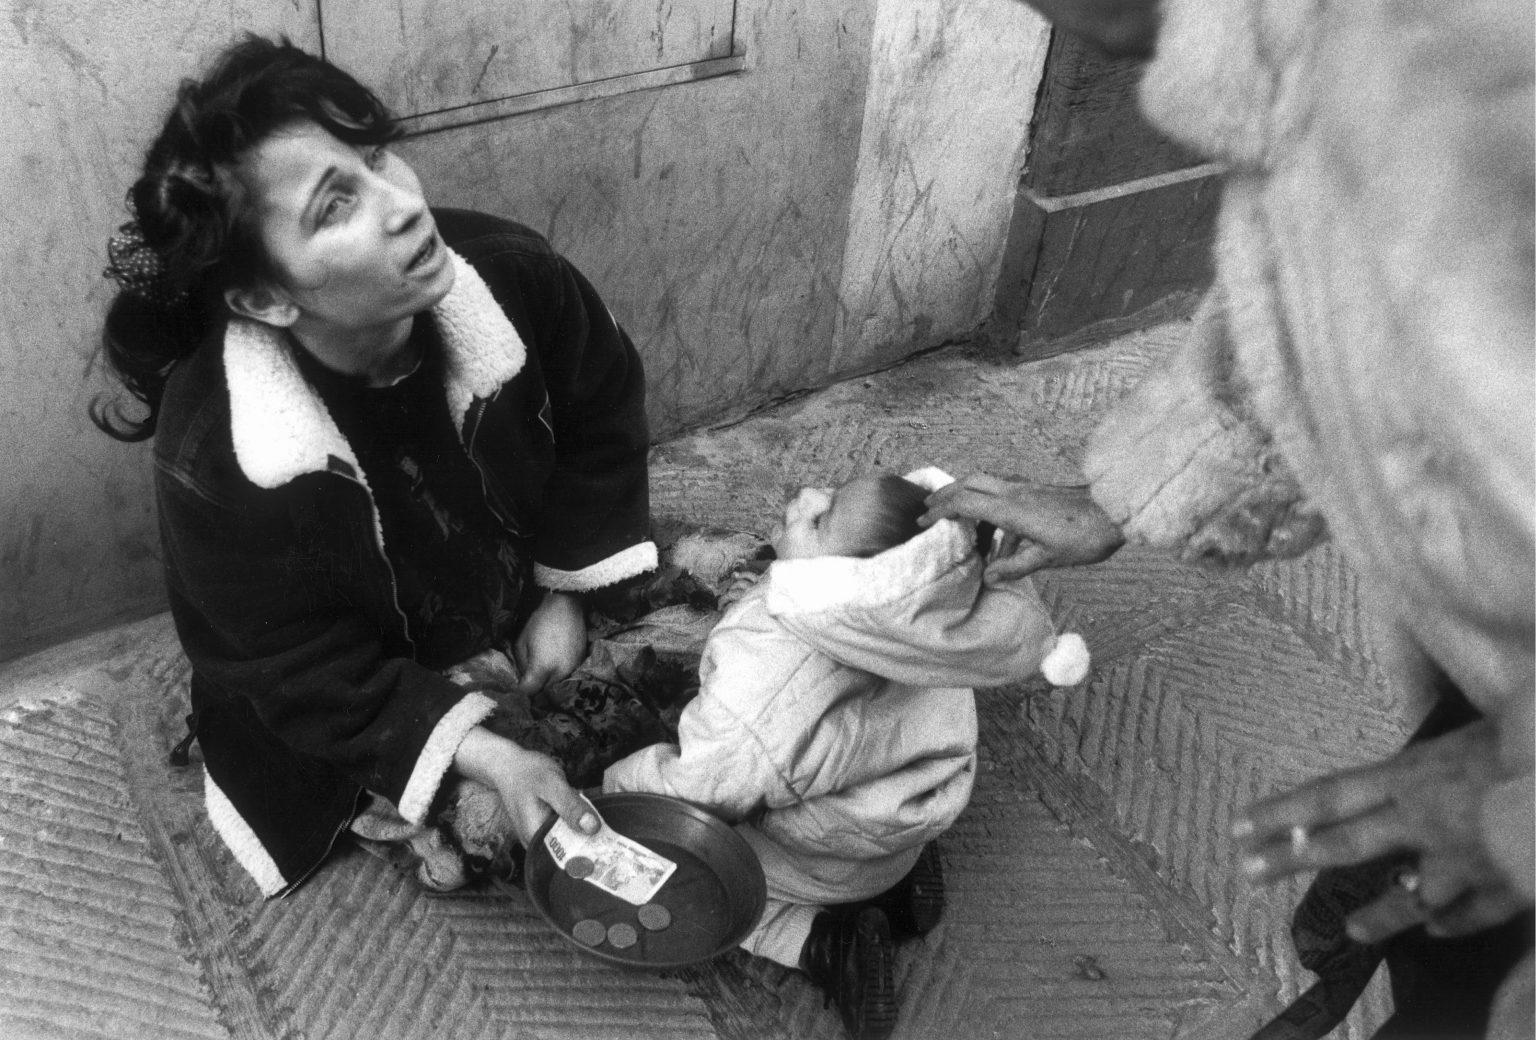 FLORENCE 1993 - GYPSIES BEGGING IN THE STREET - FIRENZE 1993 - ZINGARI CHIEDONO L' ELEMOSINA IN STRADA .